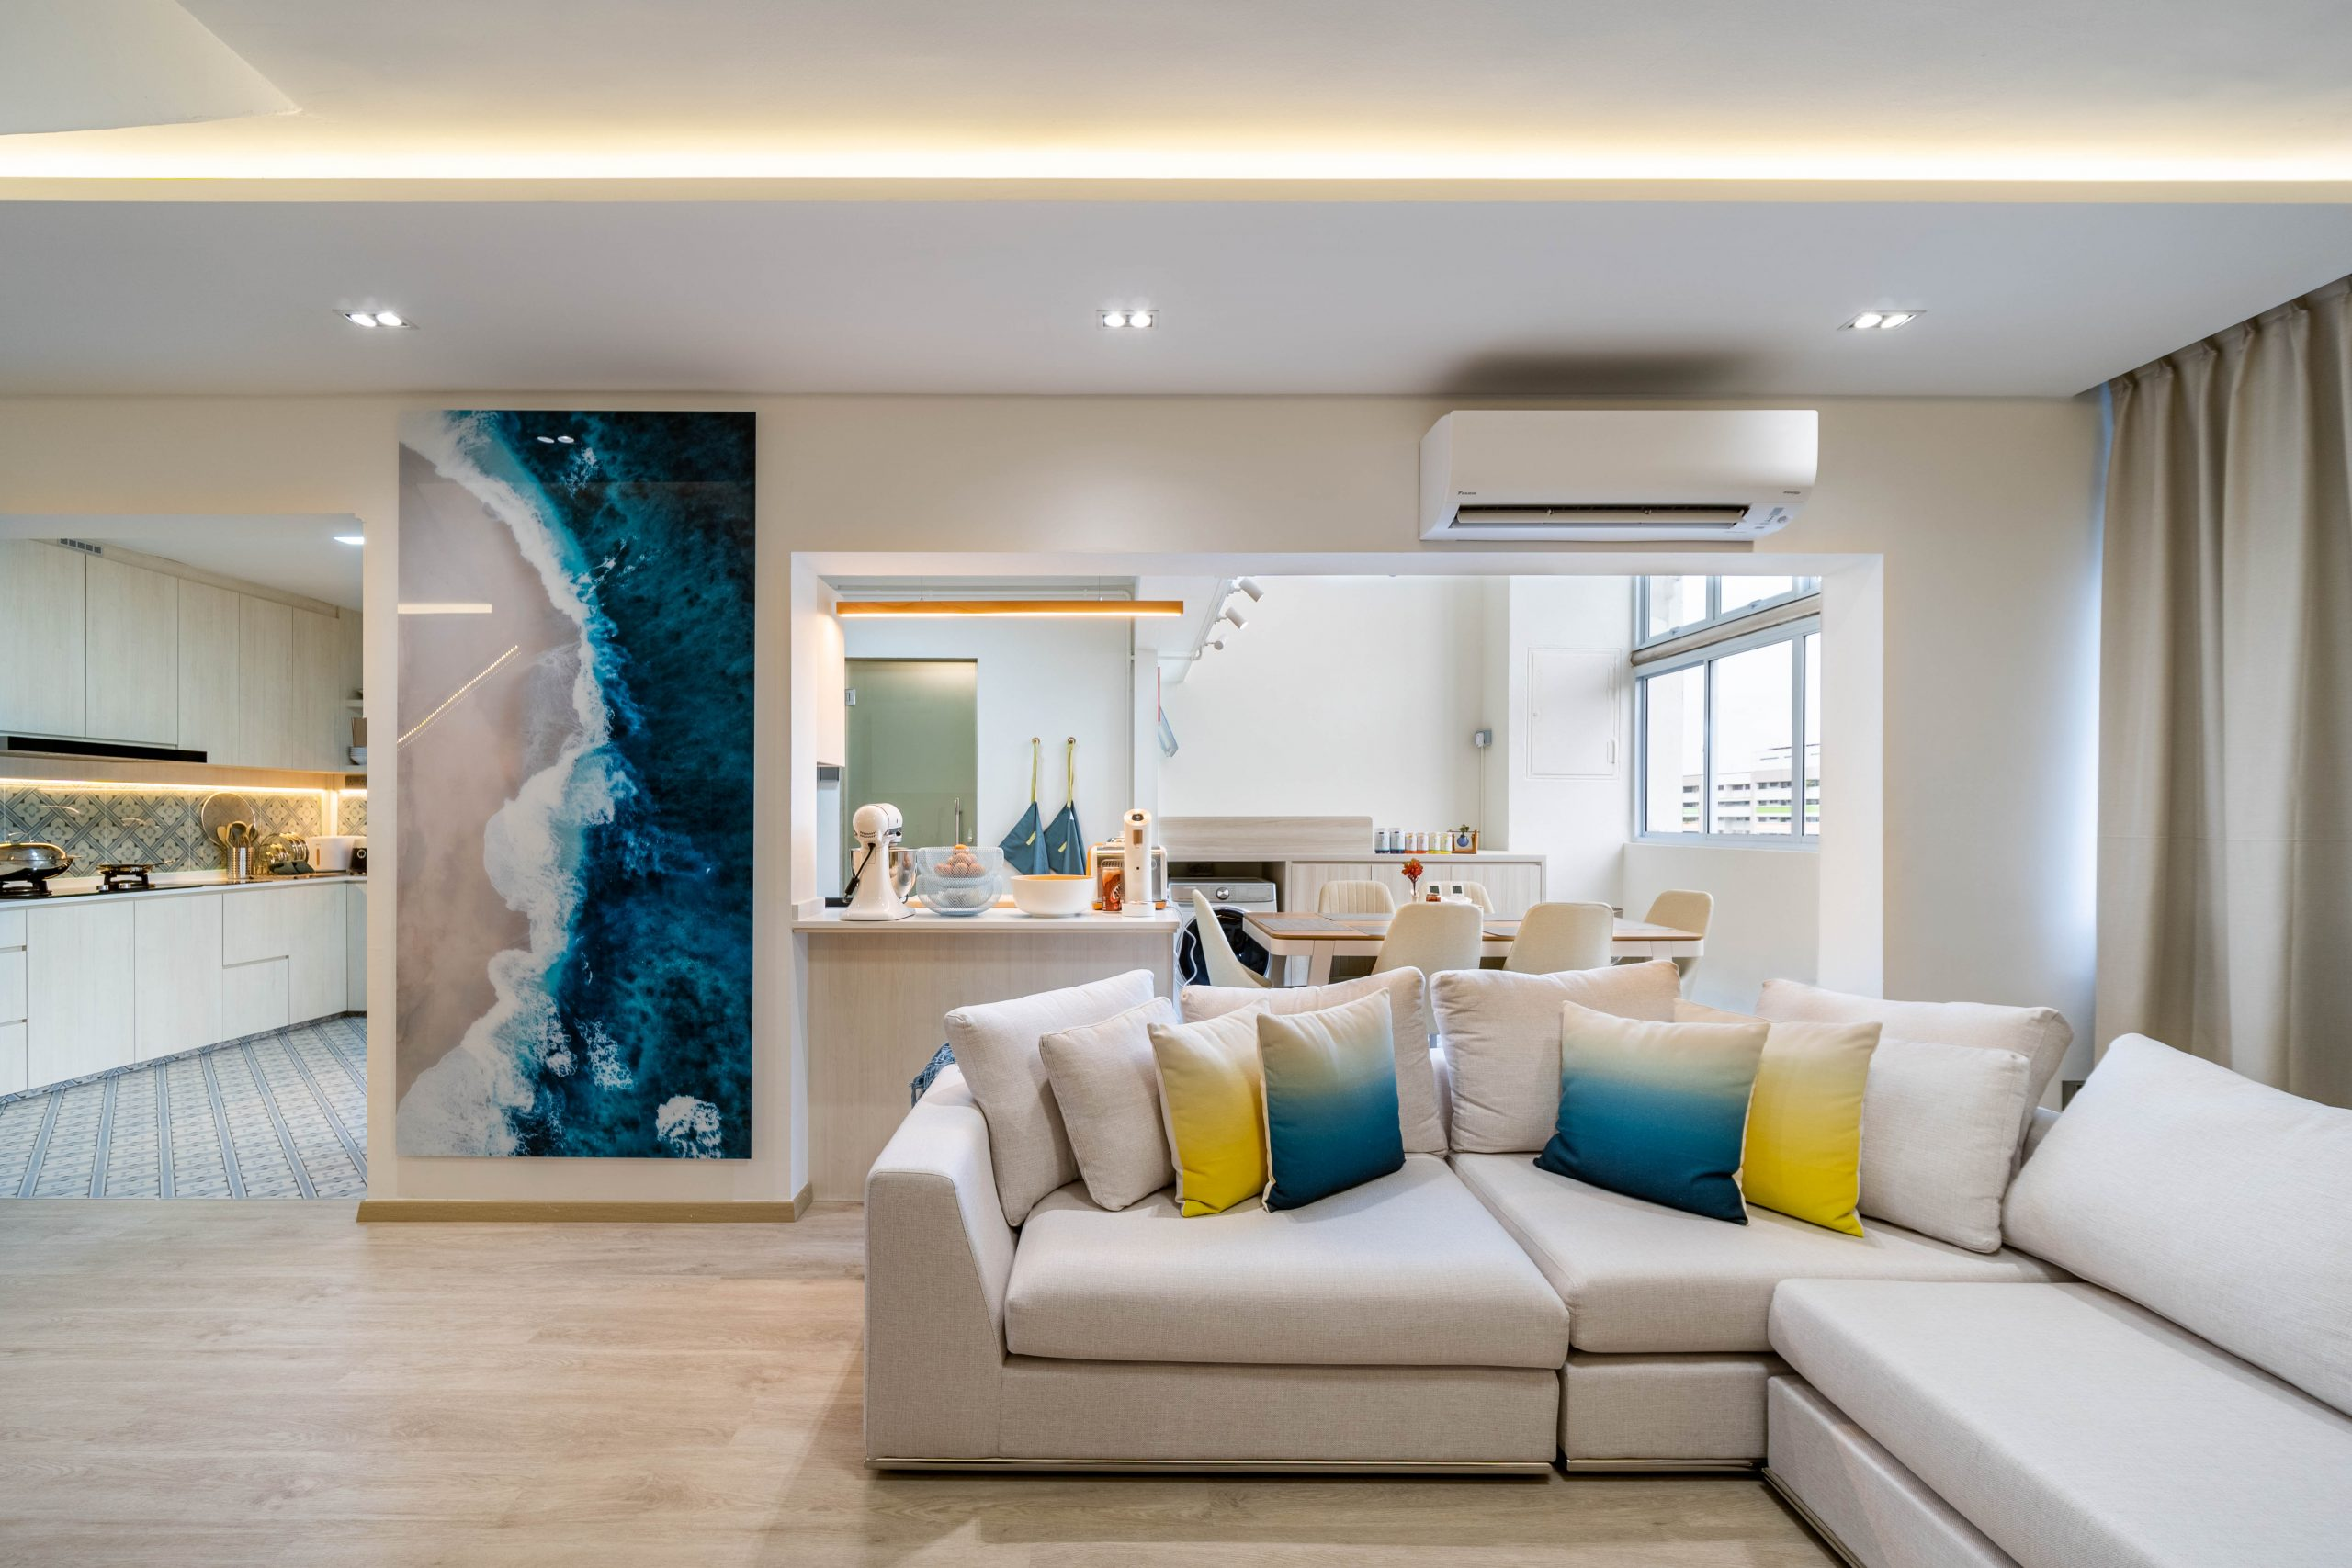 Yishun Ring HDB Executive Maisonette: Designed by Lucas Ong